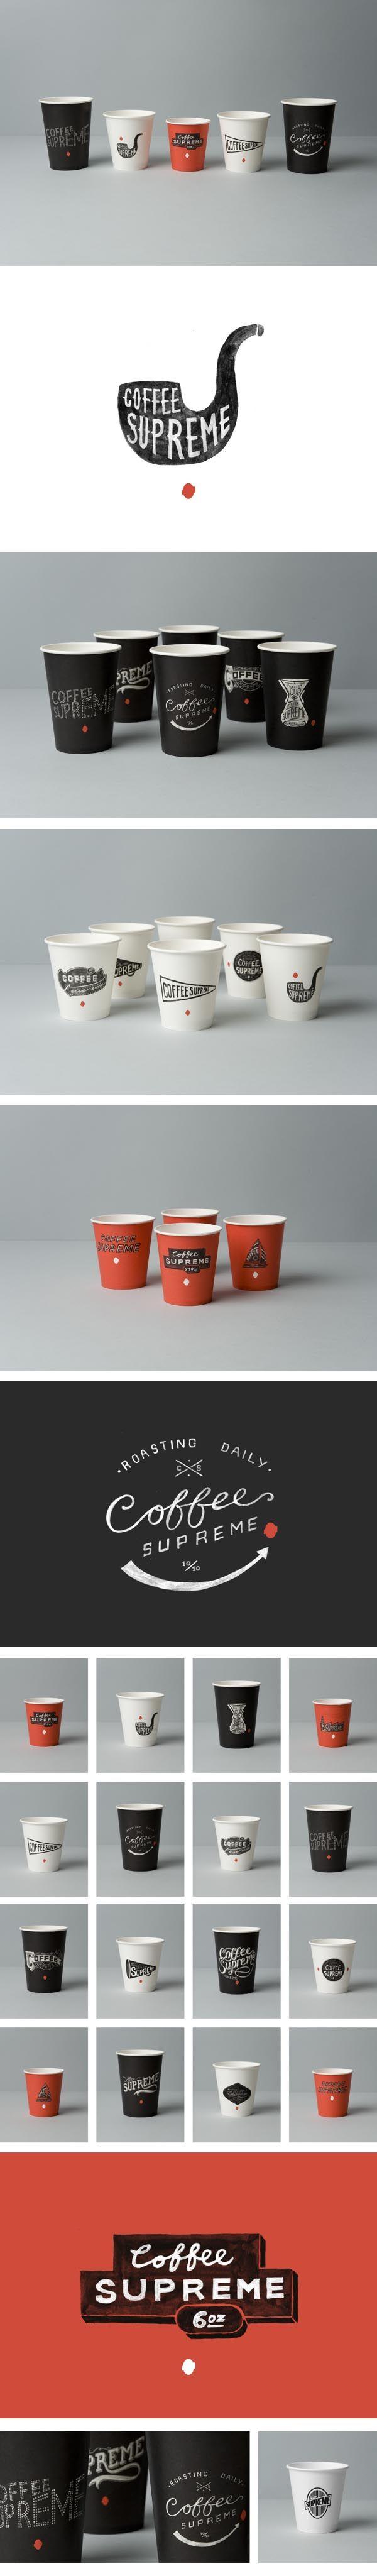 Coffee Supreme Packaging by Hardhat Designhttp://www.hardhatdesign.com/work/print/coffee-supreme-nz-and-aust/coffee-supreme